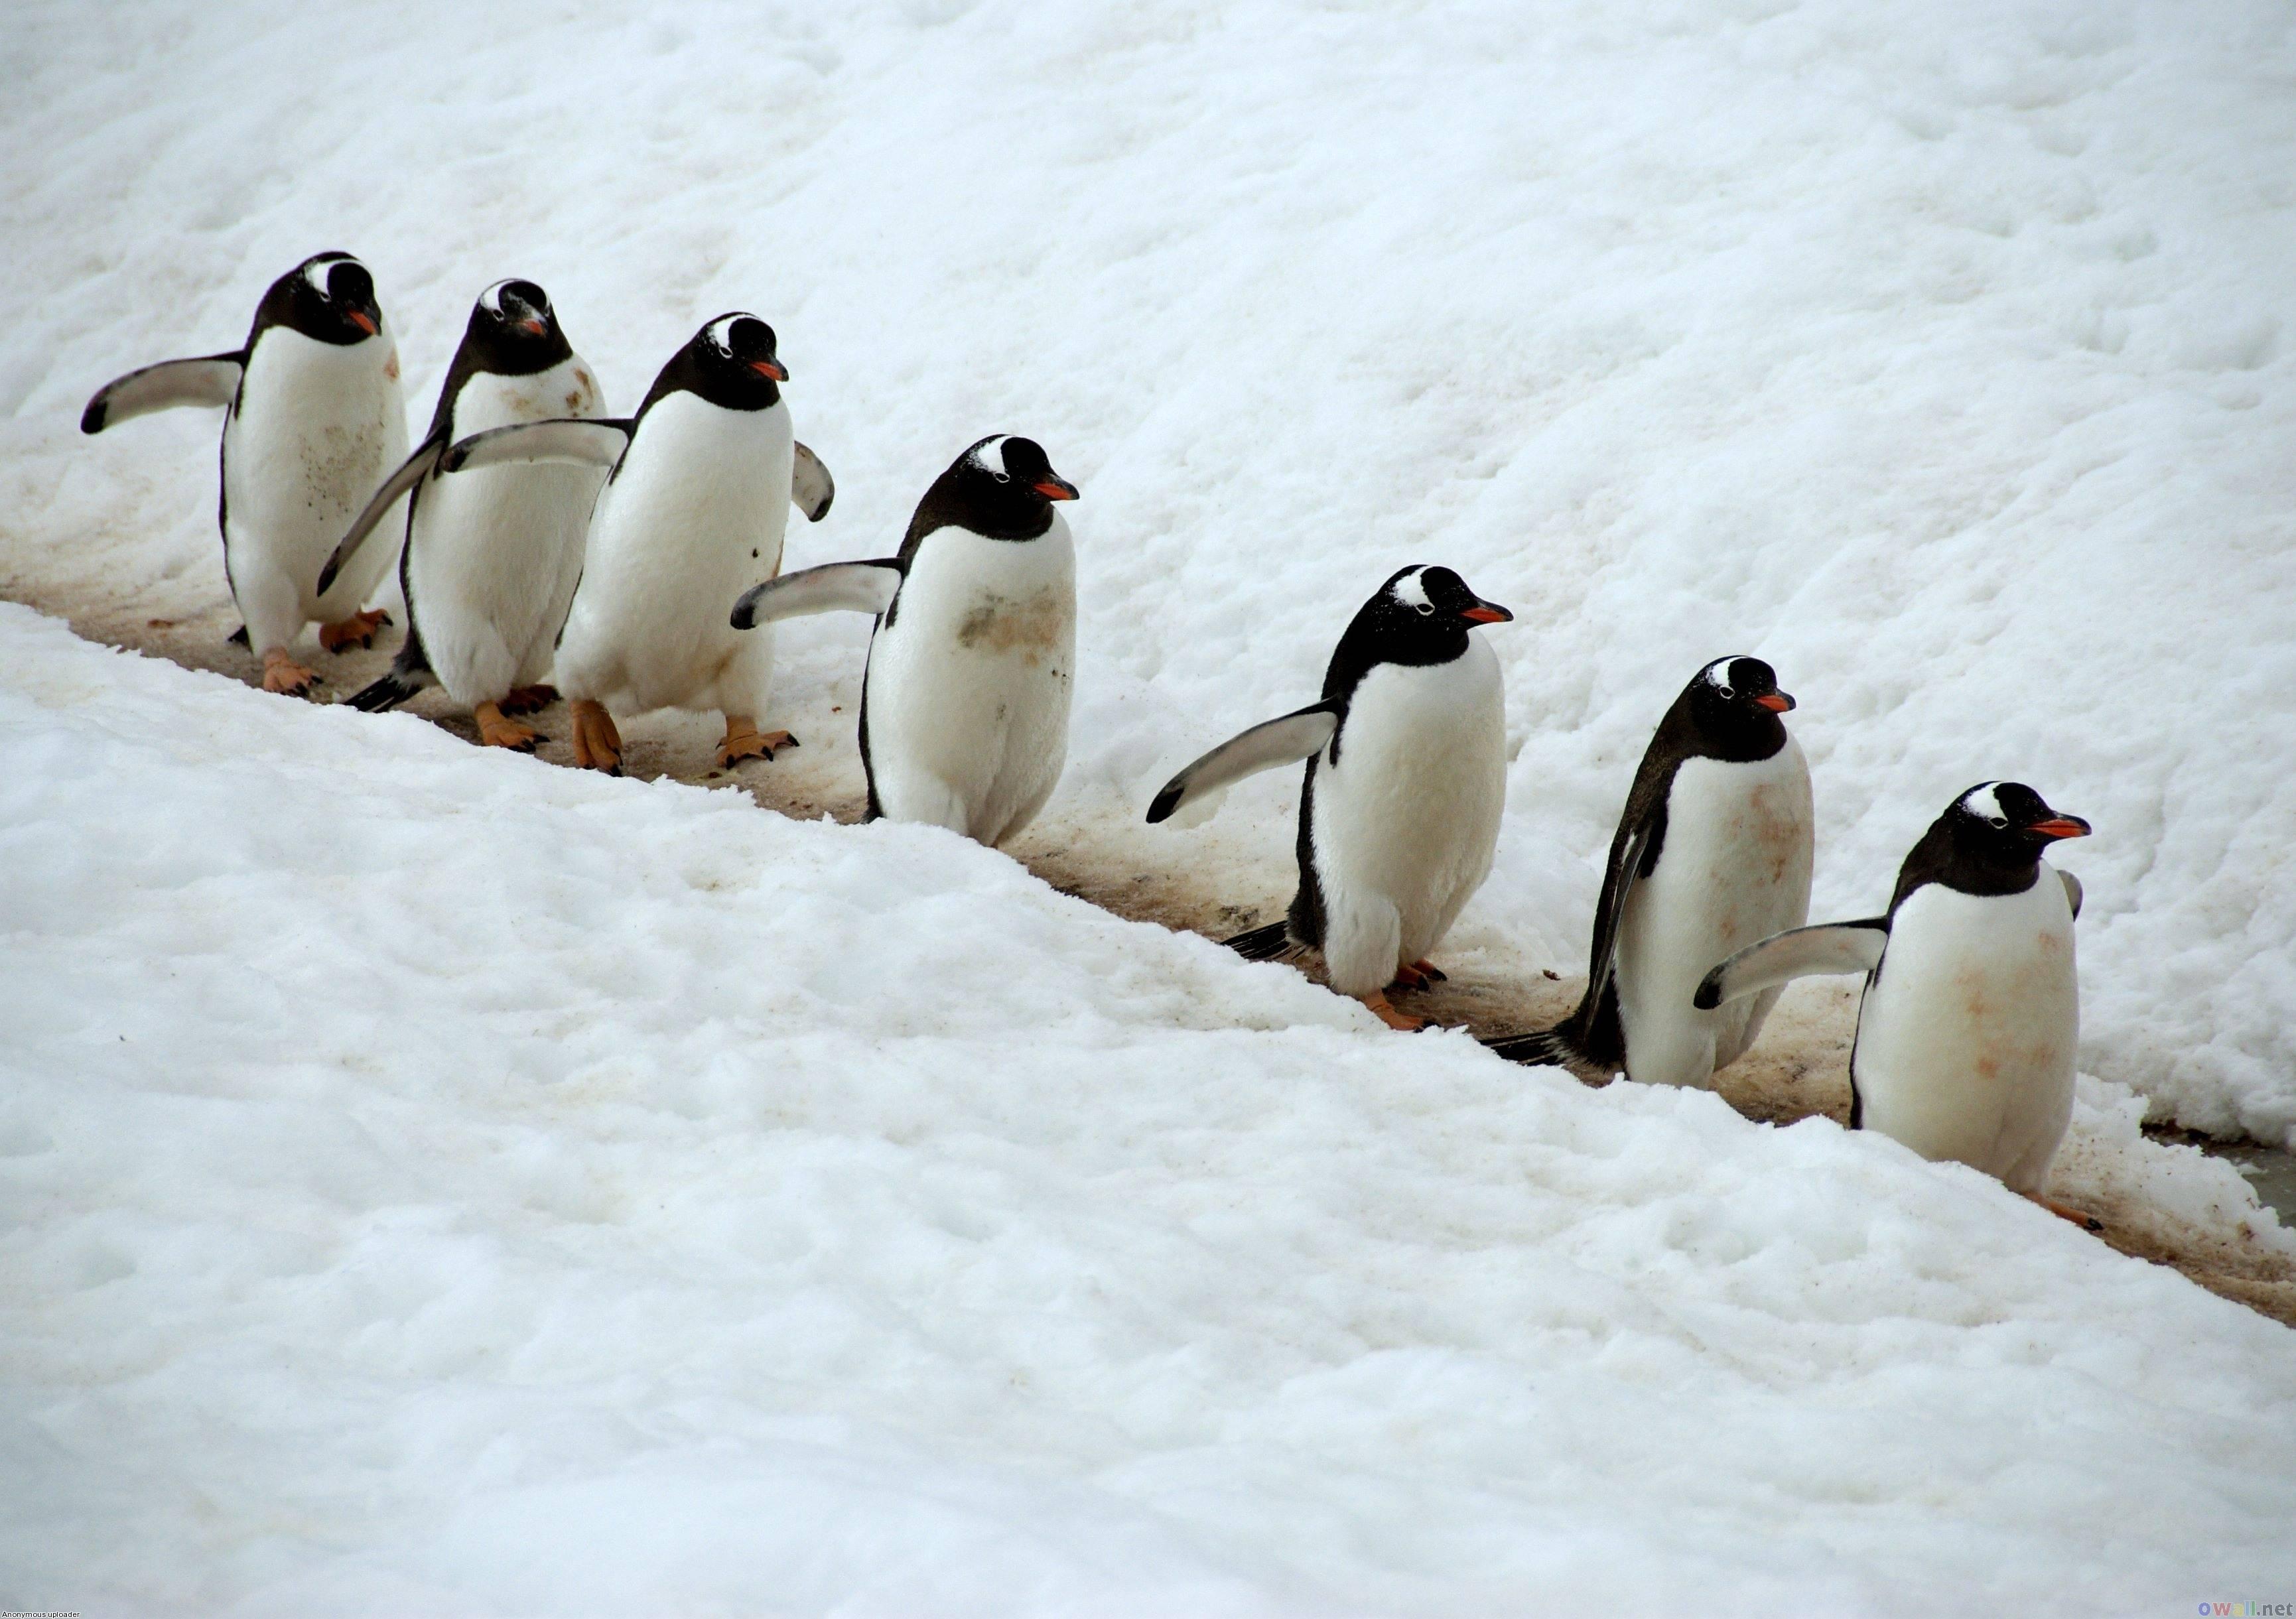 penguin wallpaper wallpapers - photo #5